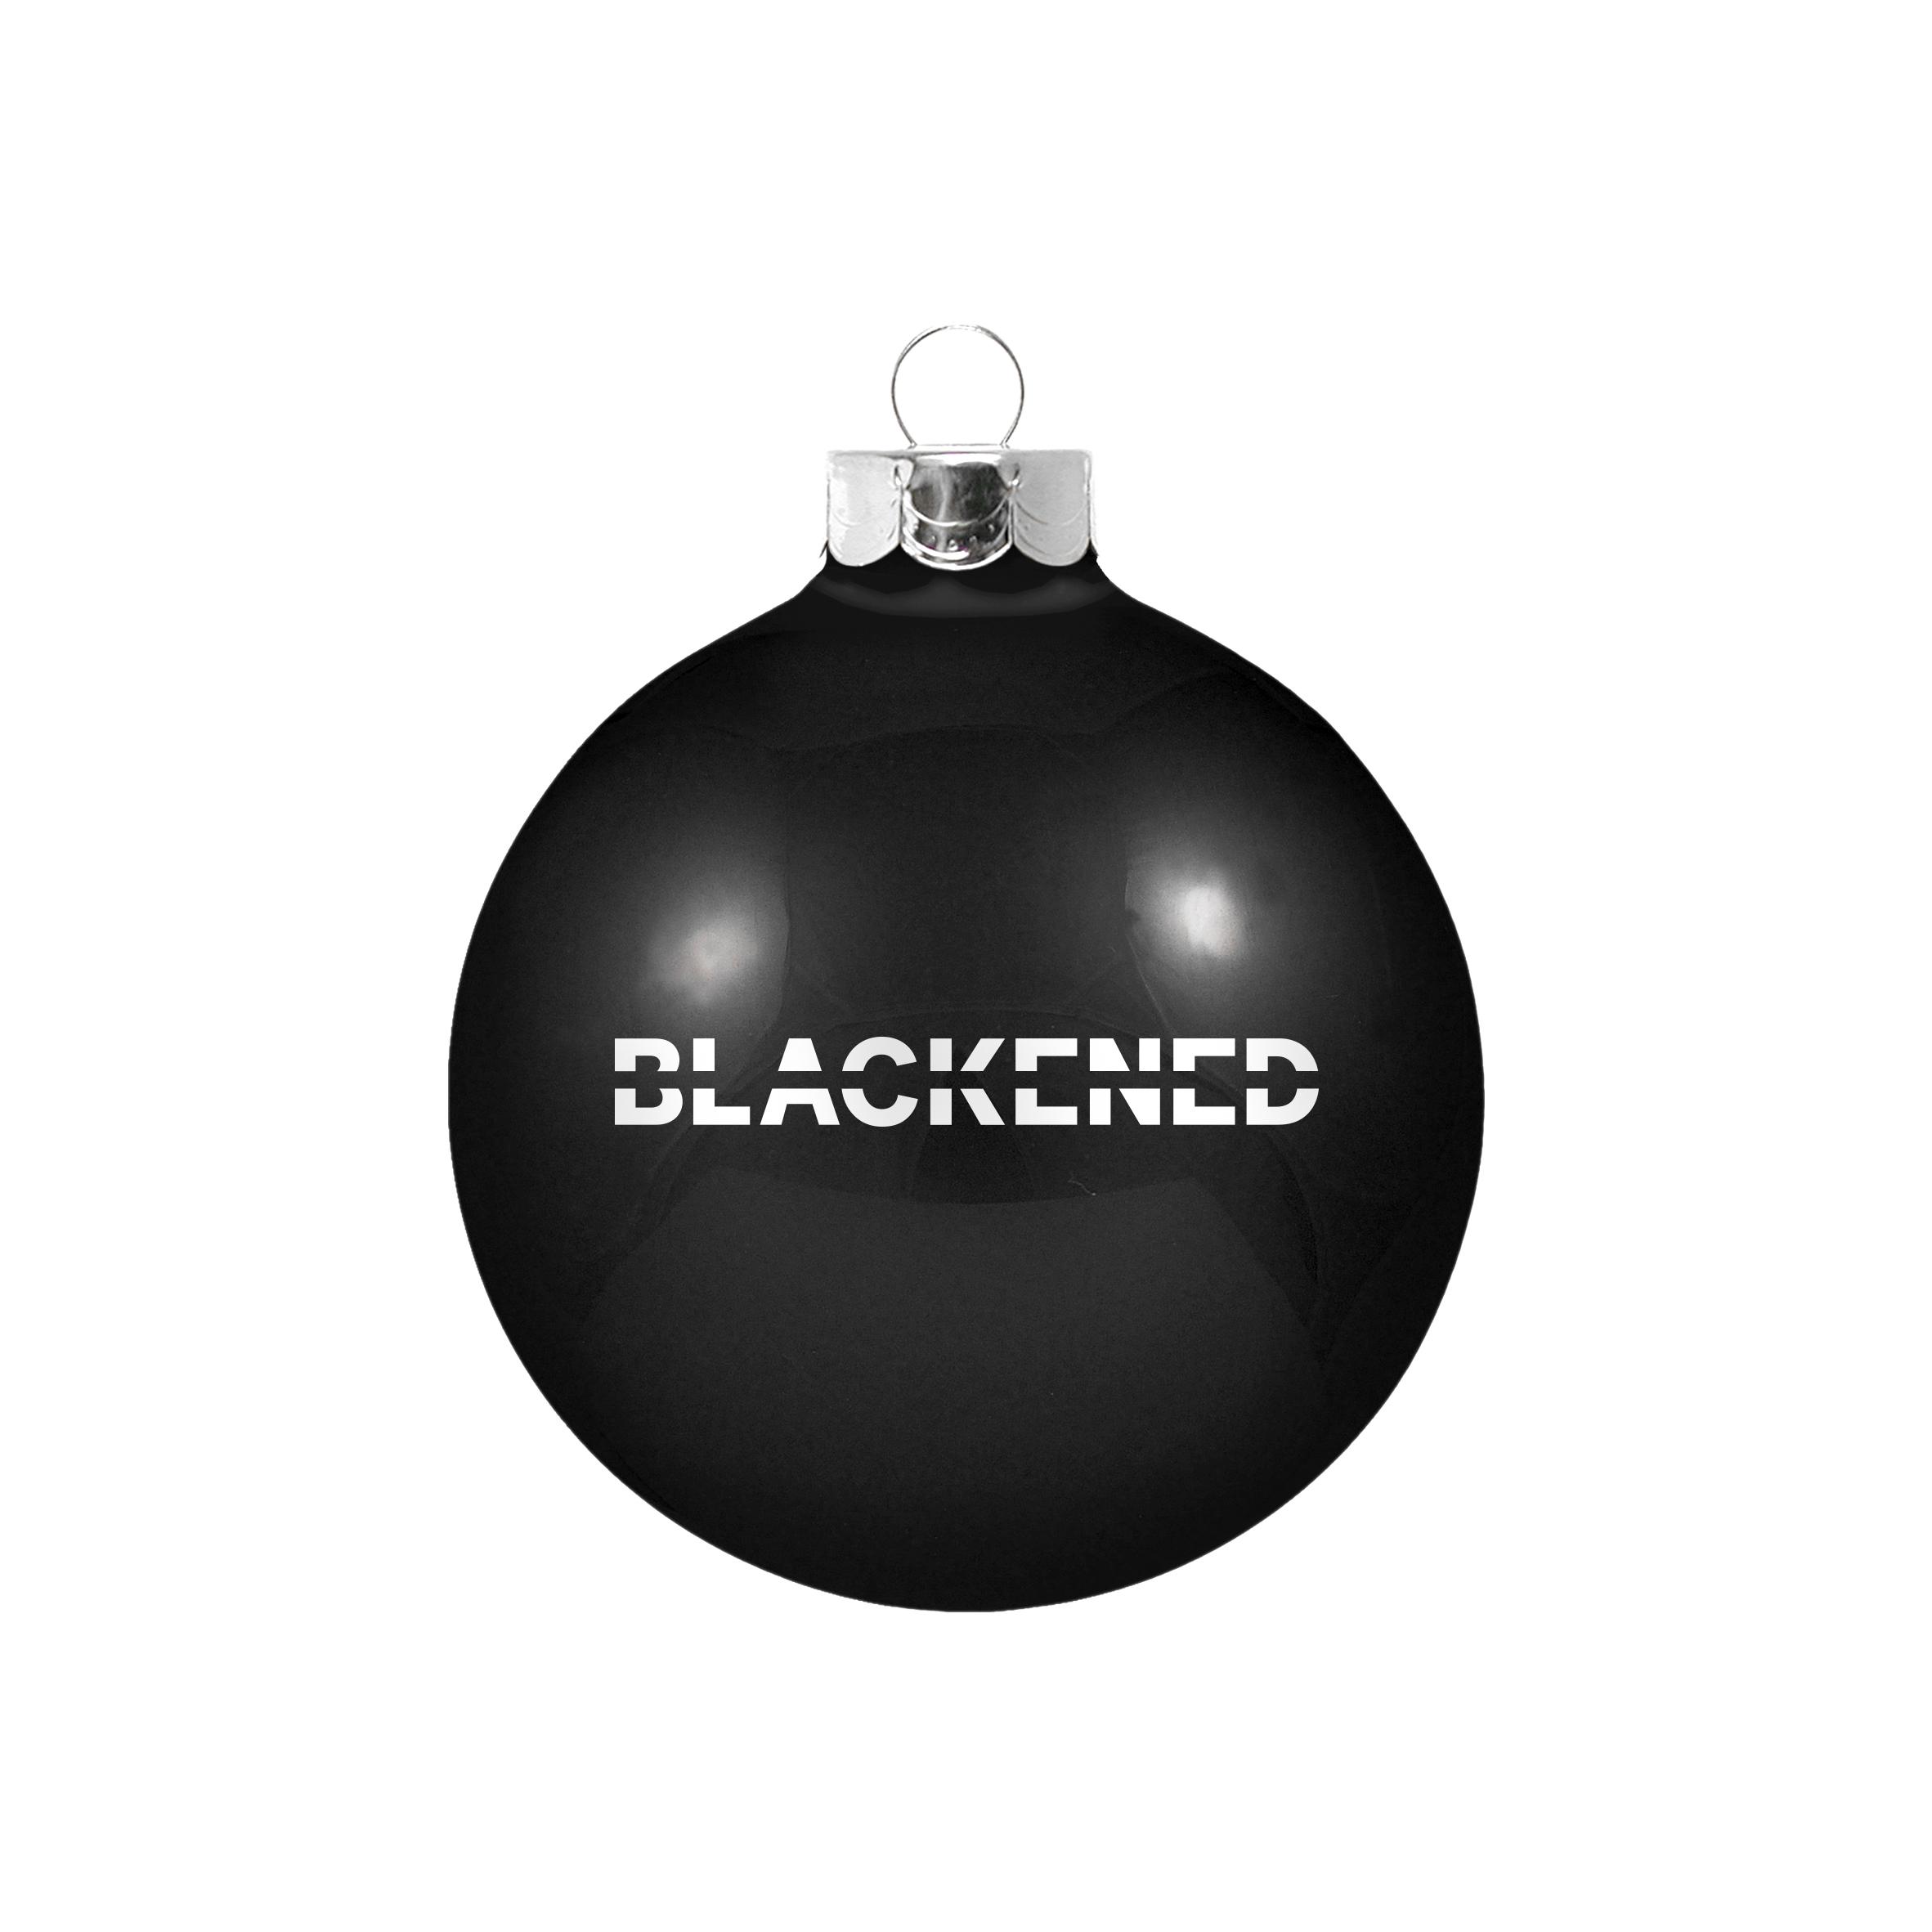 Blackened Whiskey Holiday Ornament | Metallica | Metallica.com